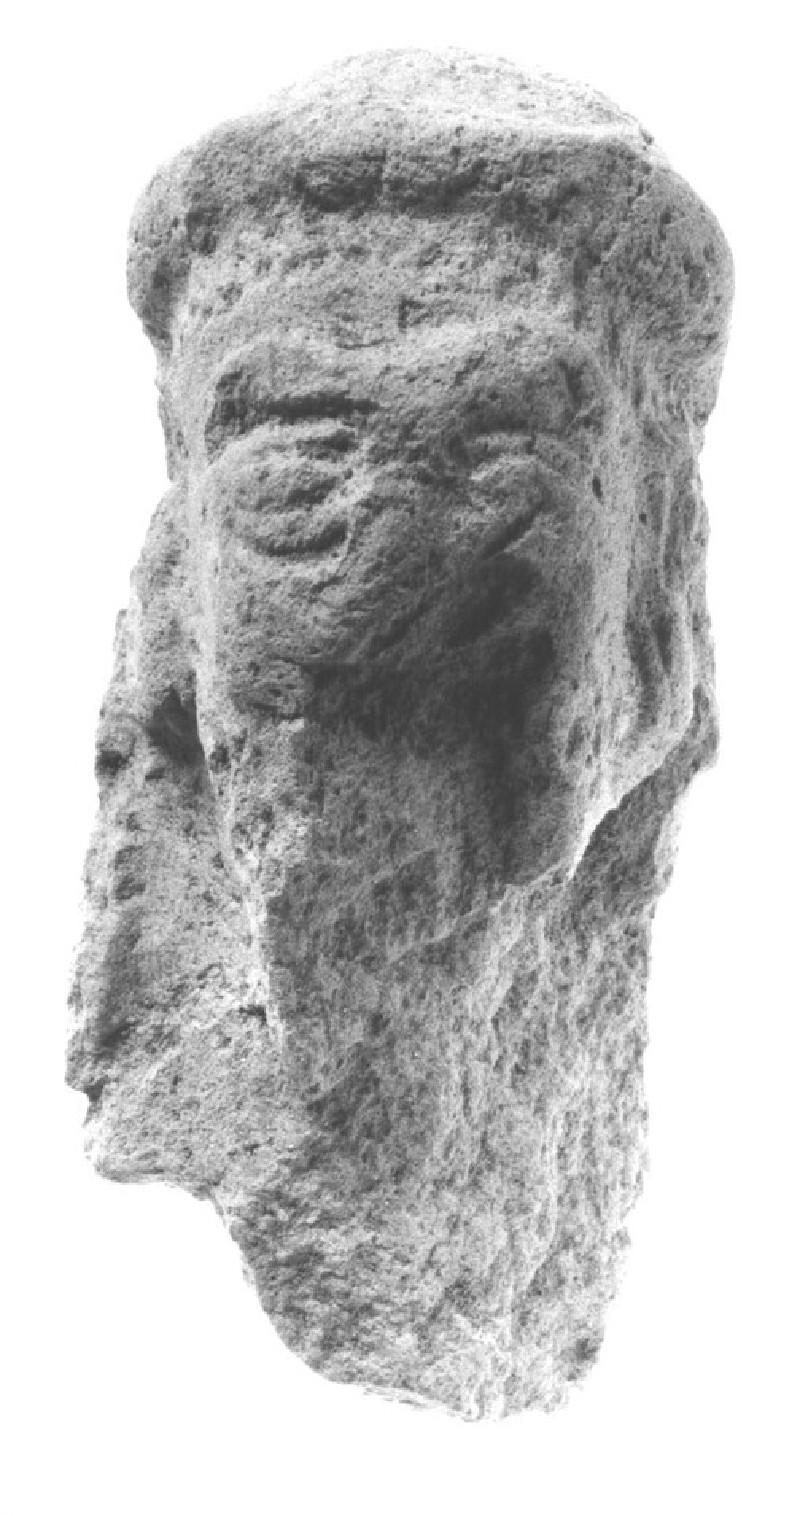 Figurine of a male head